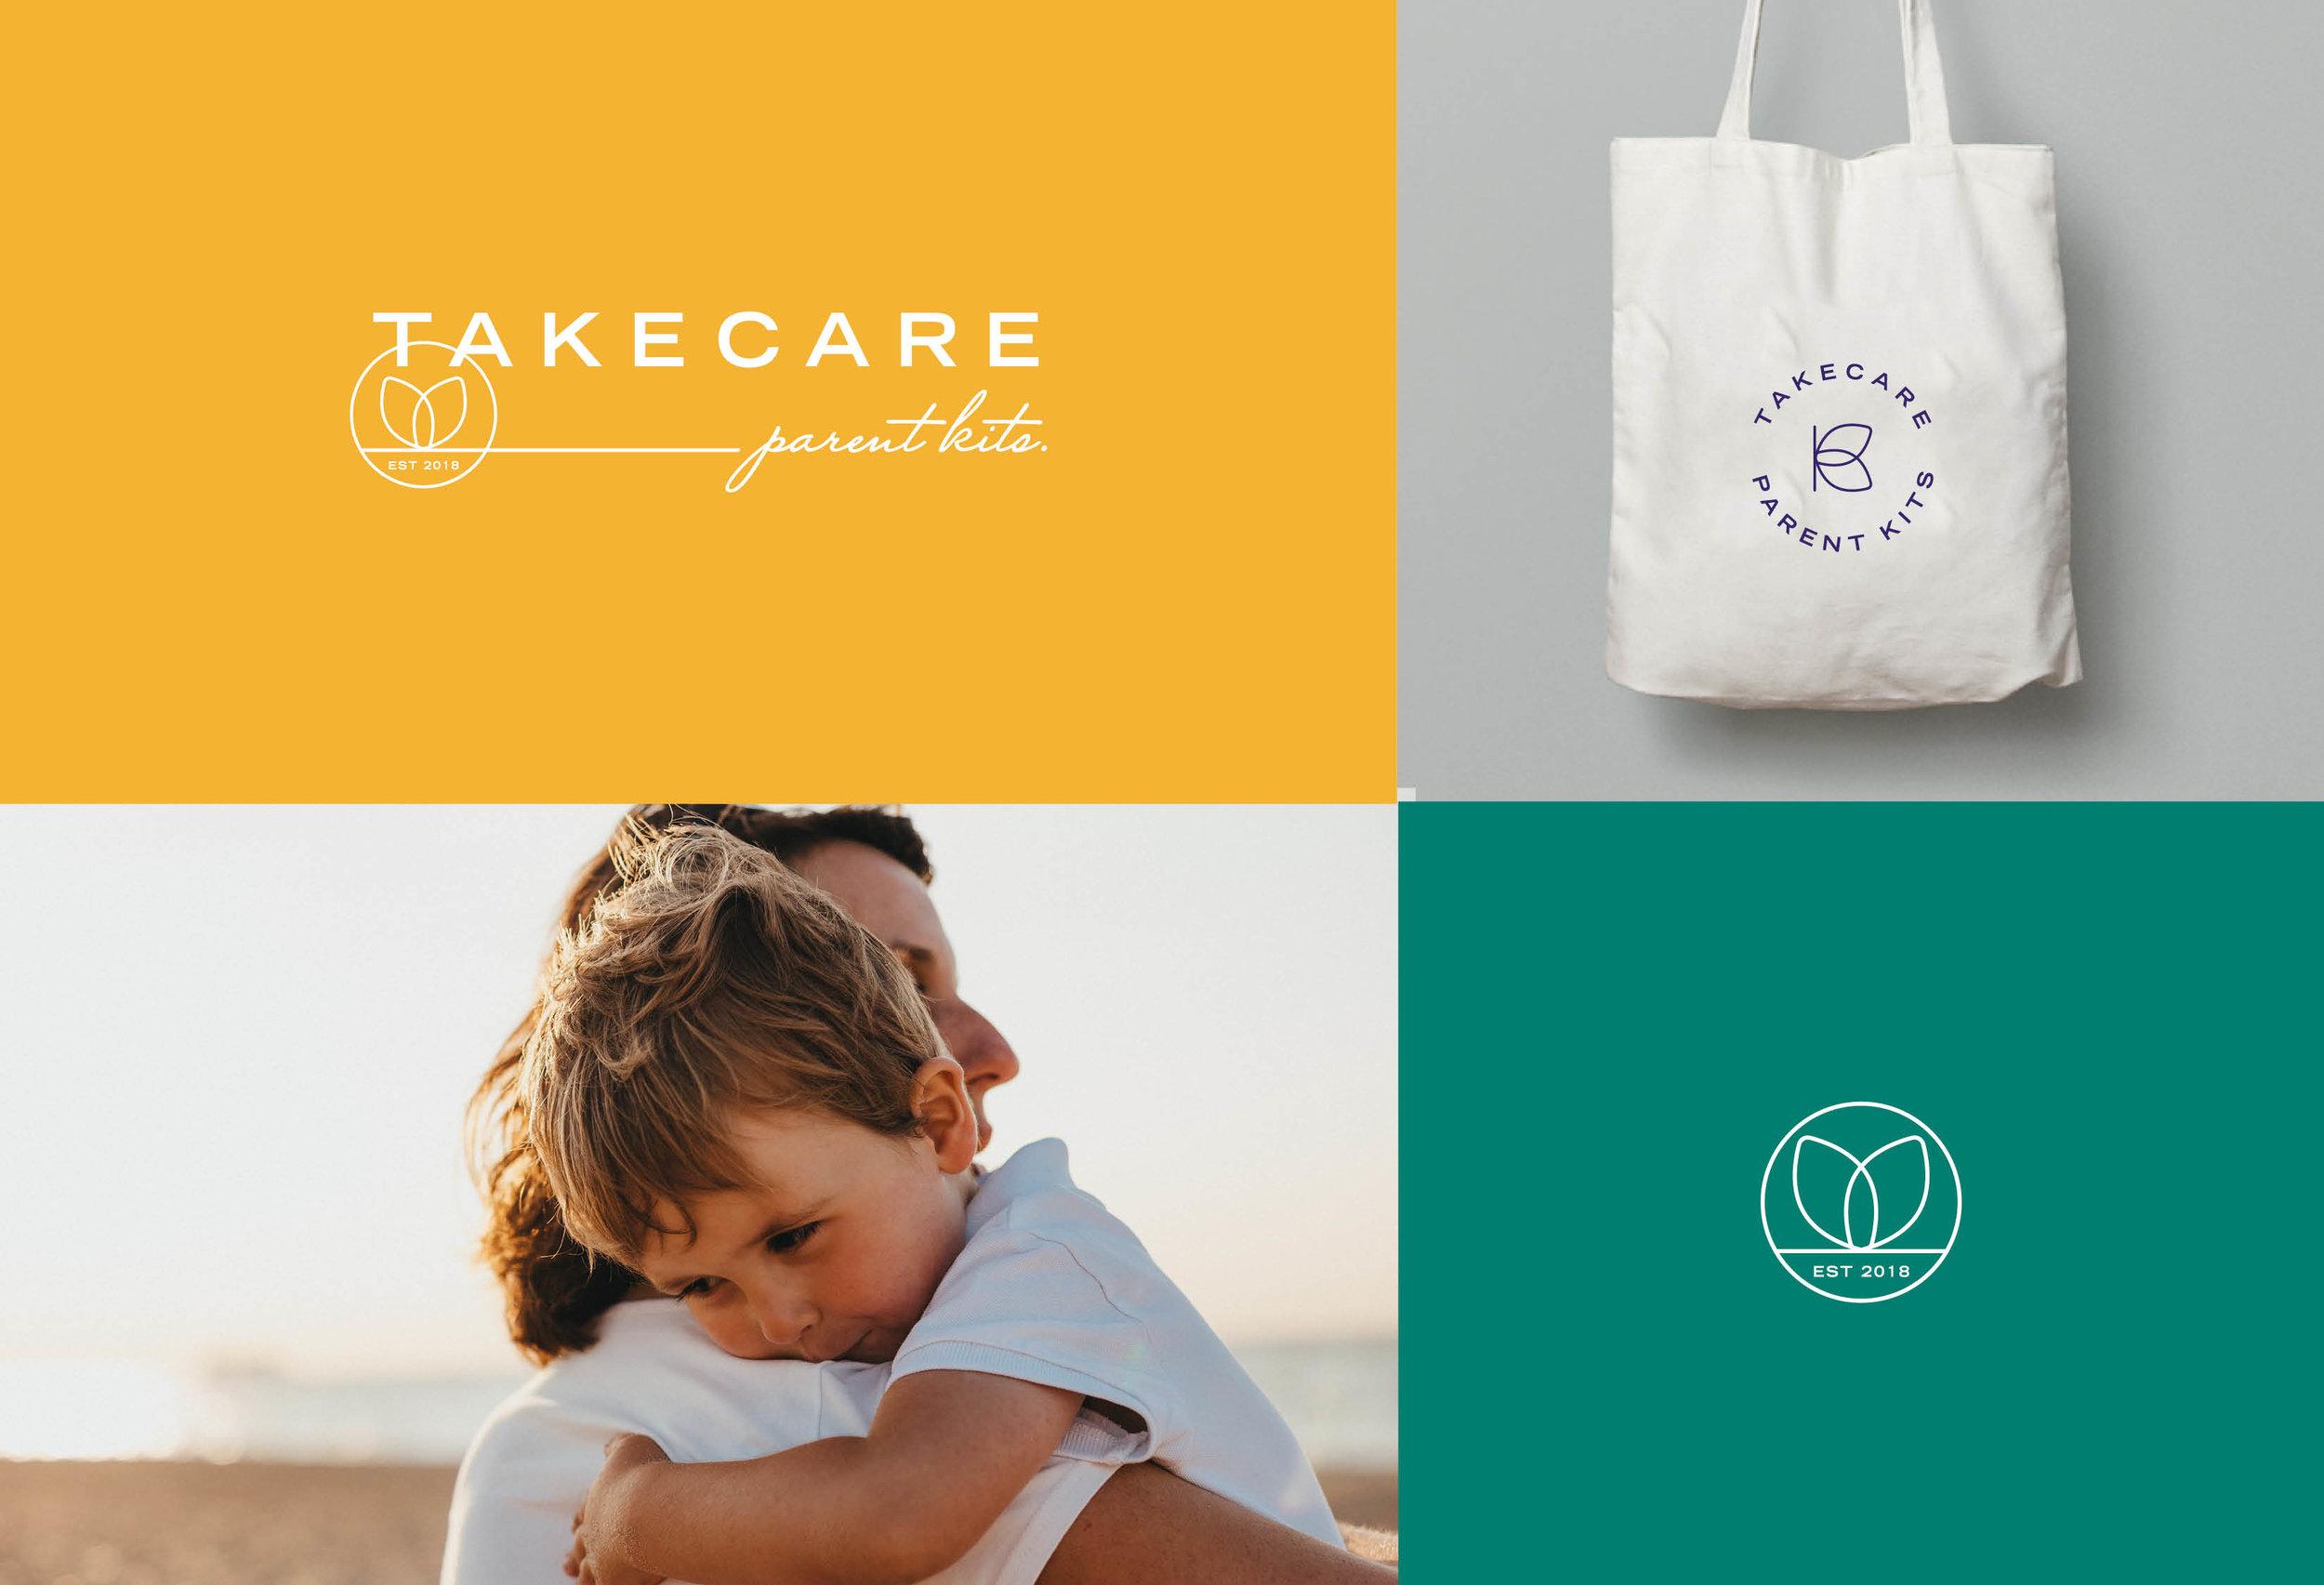 takecare-kits-toronto.jpg